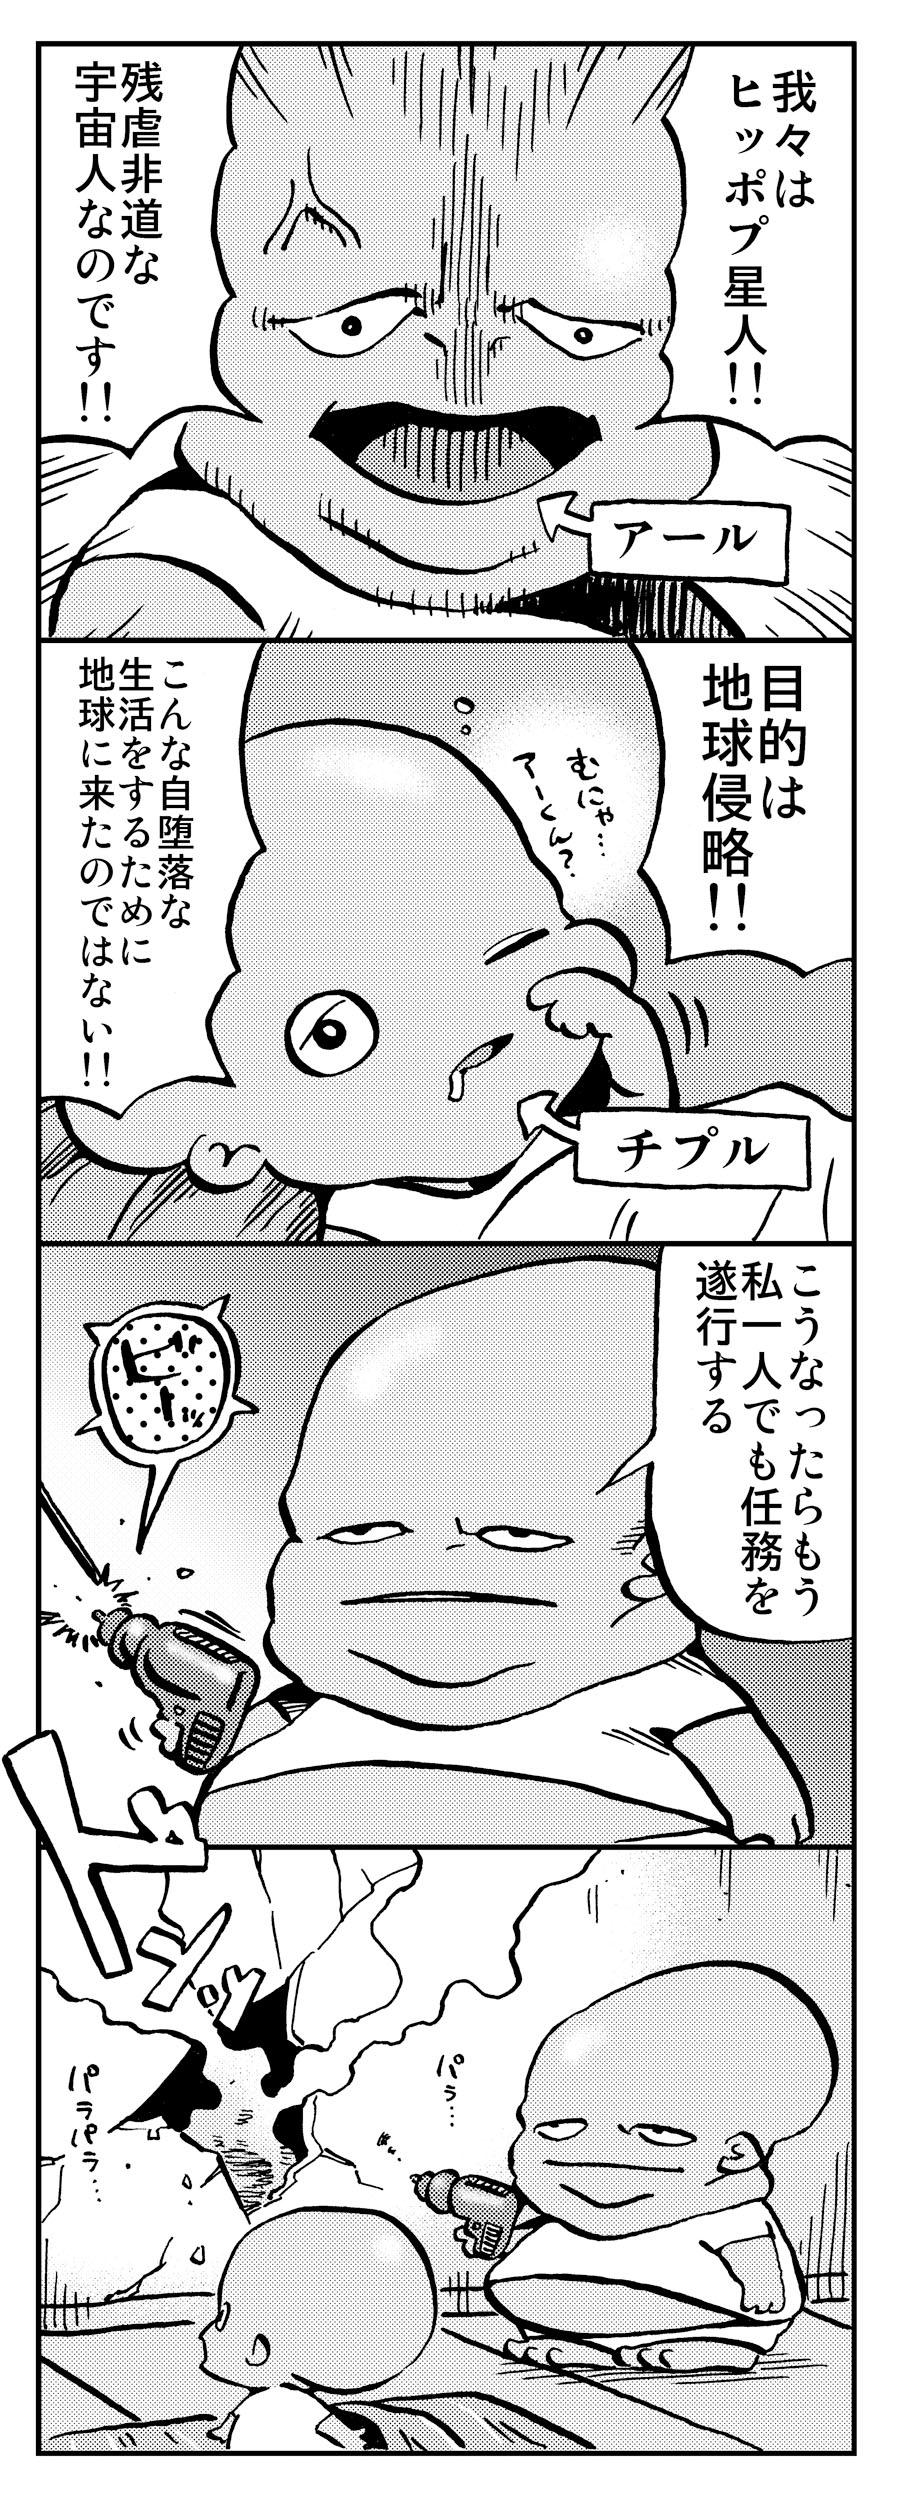 hippseijin_manga_02_01